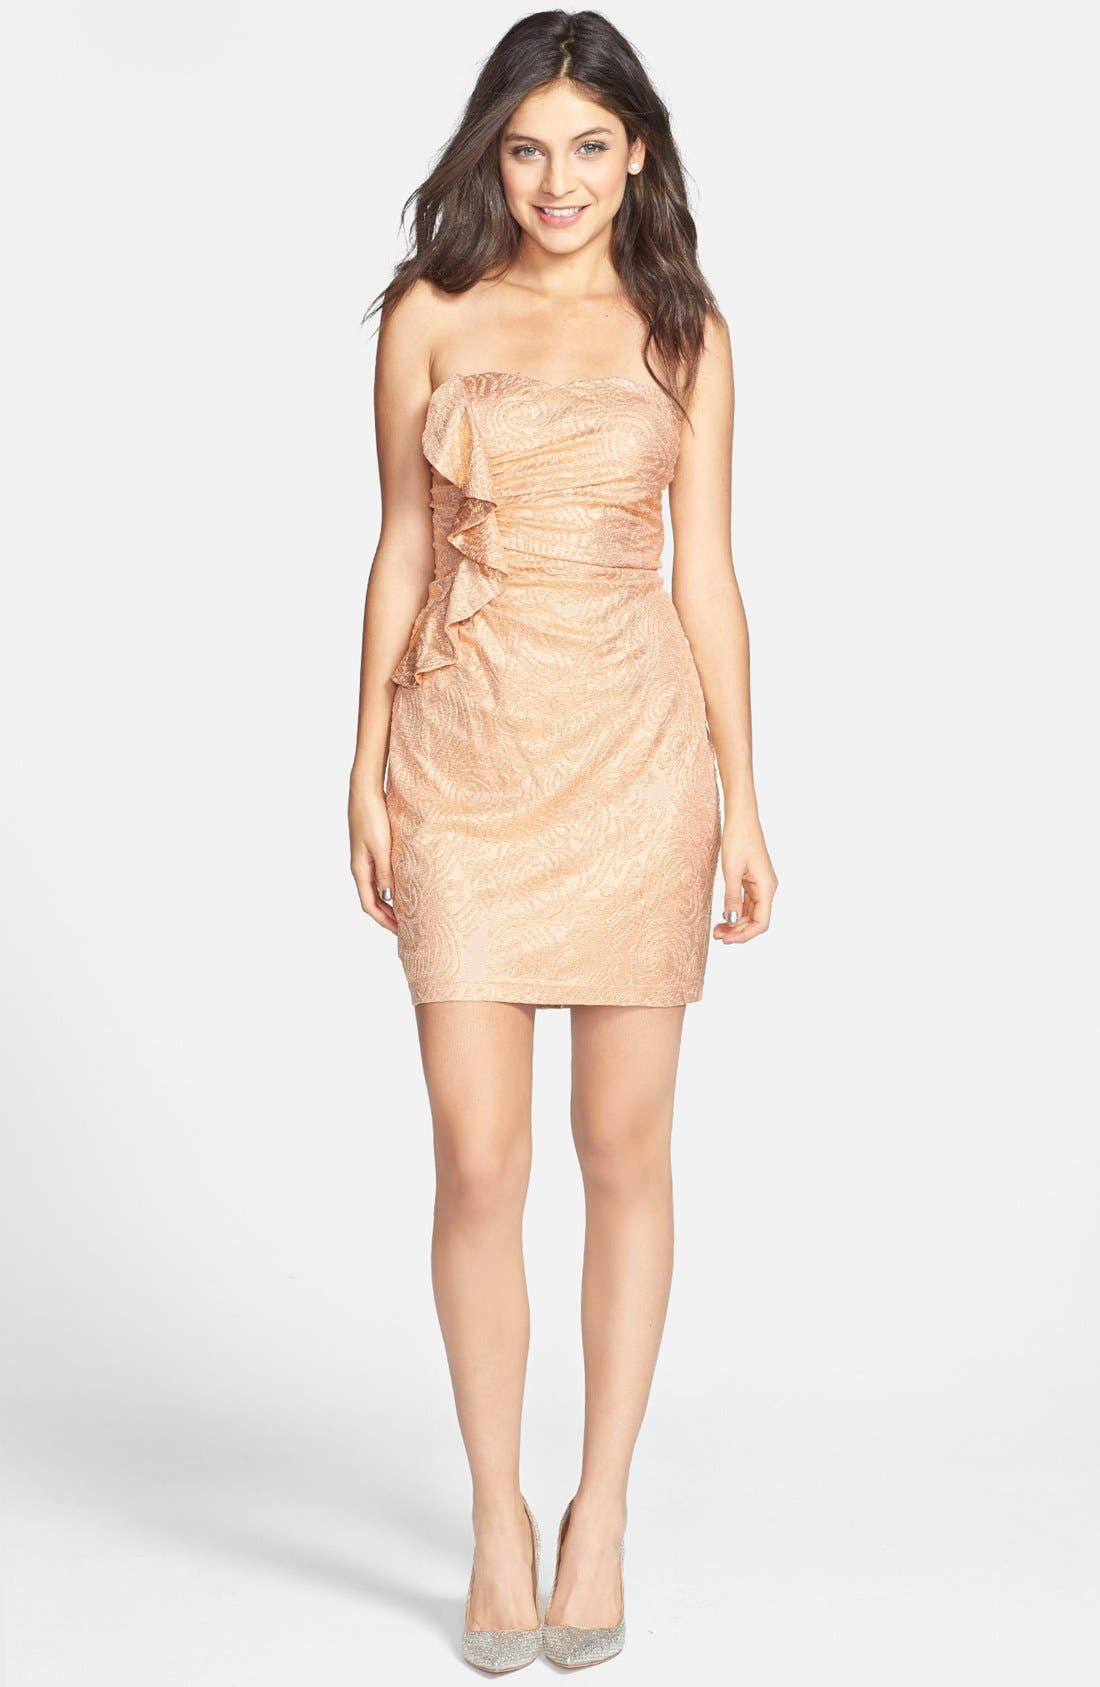 Alternate Image 1 Selected - Hailey Logan Ruffle Metallic Tube Dress (Juniors) (Online Only)